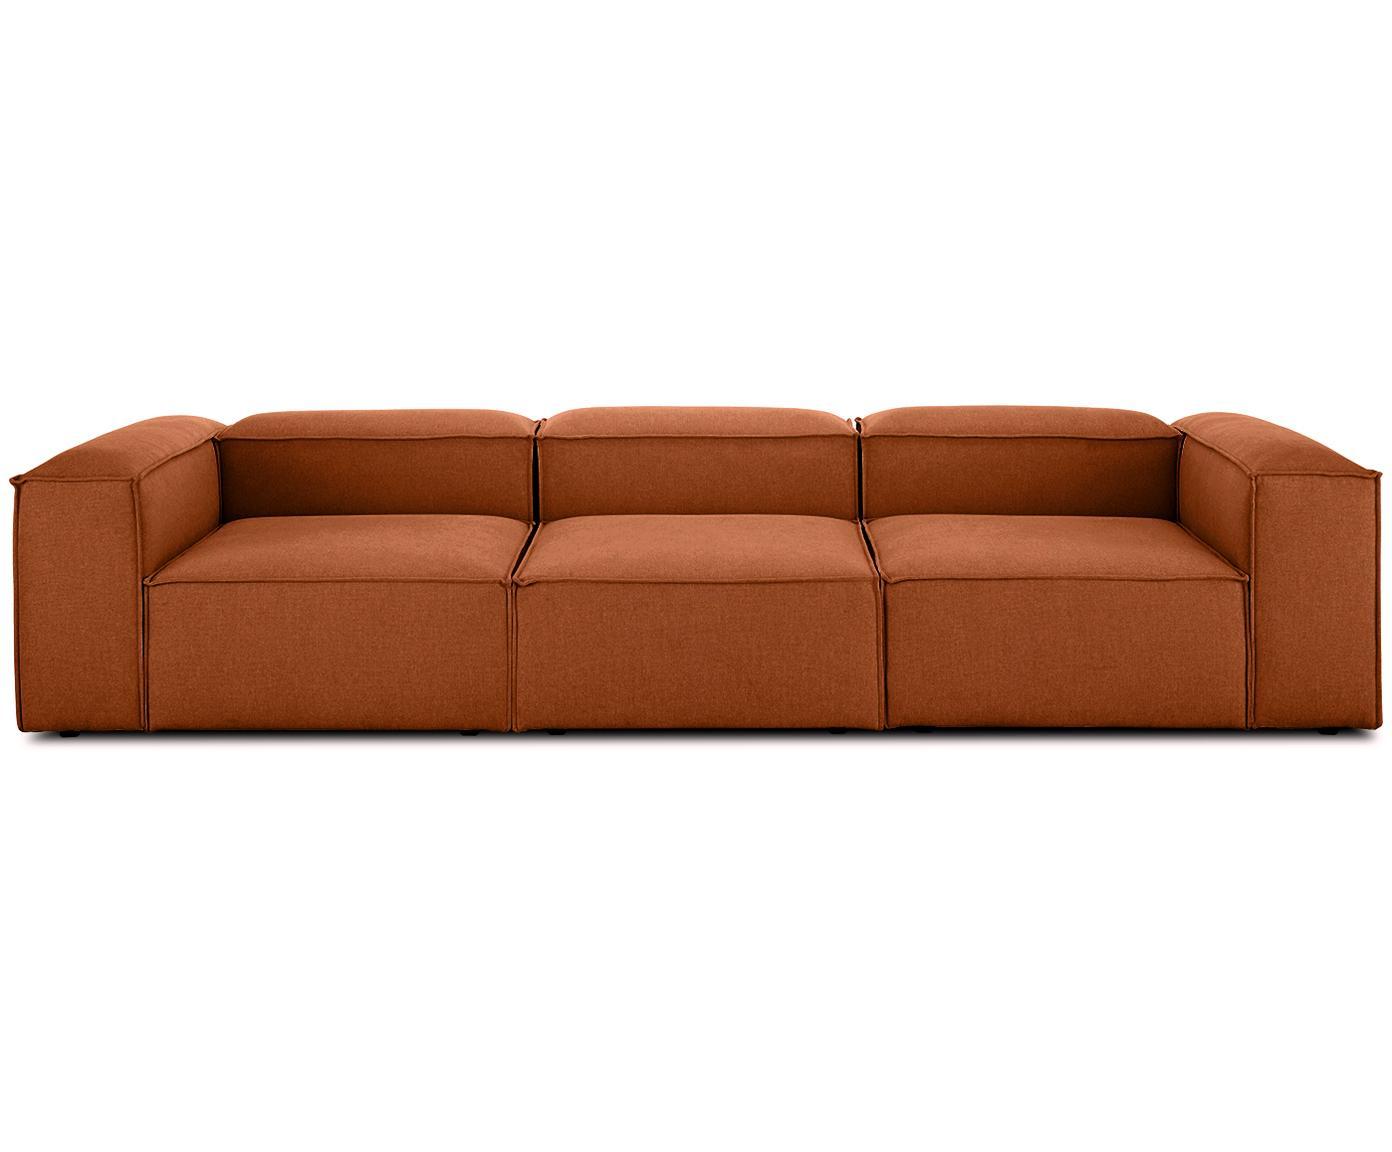 Modulares Sofa Lennon (4-Sitzer), Bezug: Polyester 35.000 Scheuert, Gestell: Massives Kiefernholz, Spe, Webstoff Terrakotta, B 326 x T 119 cm